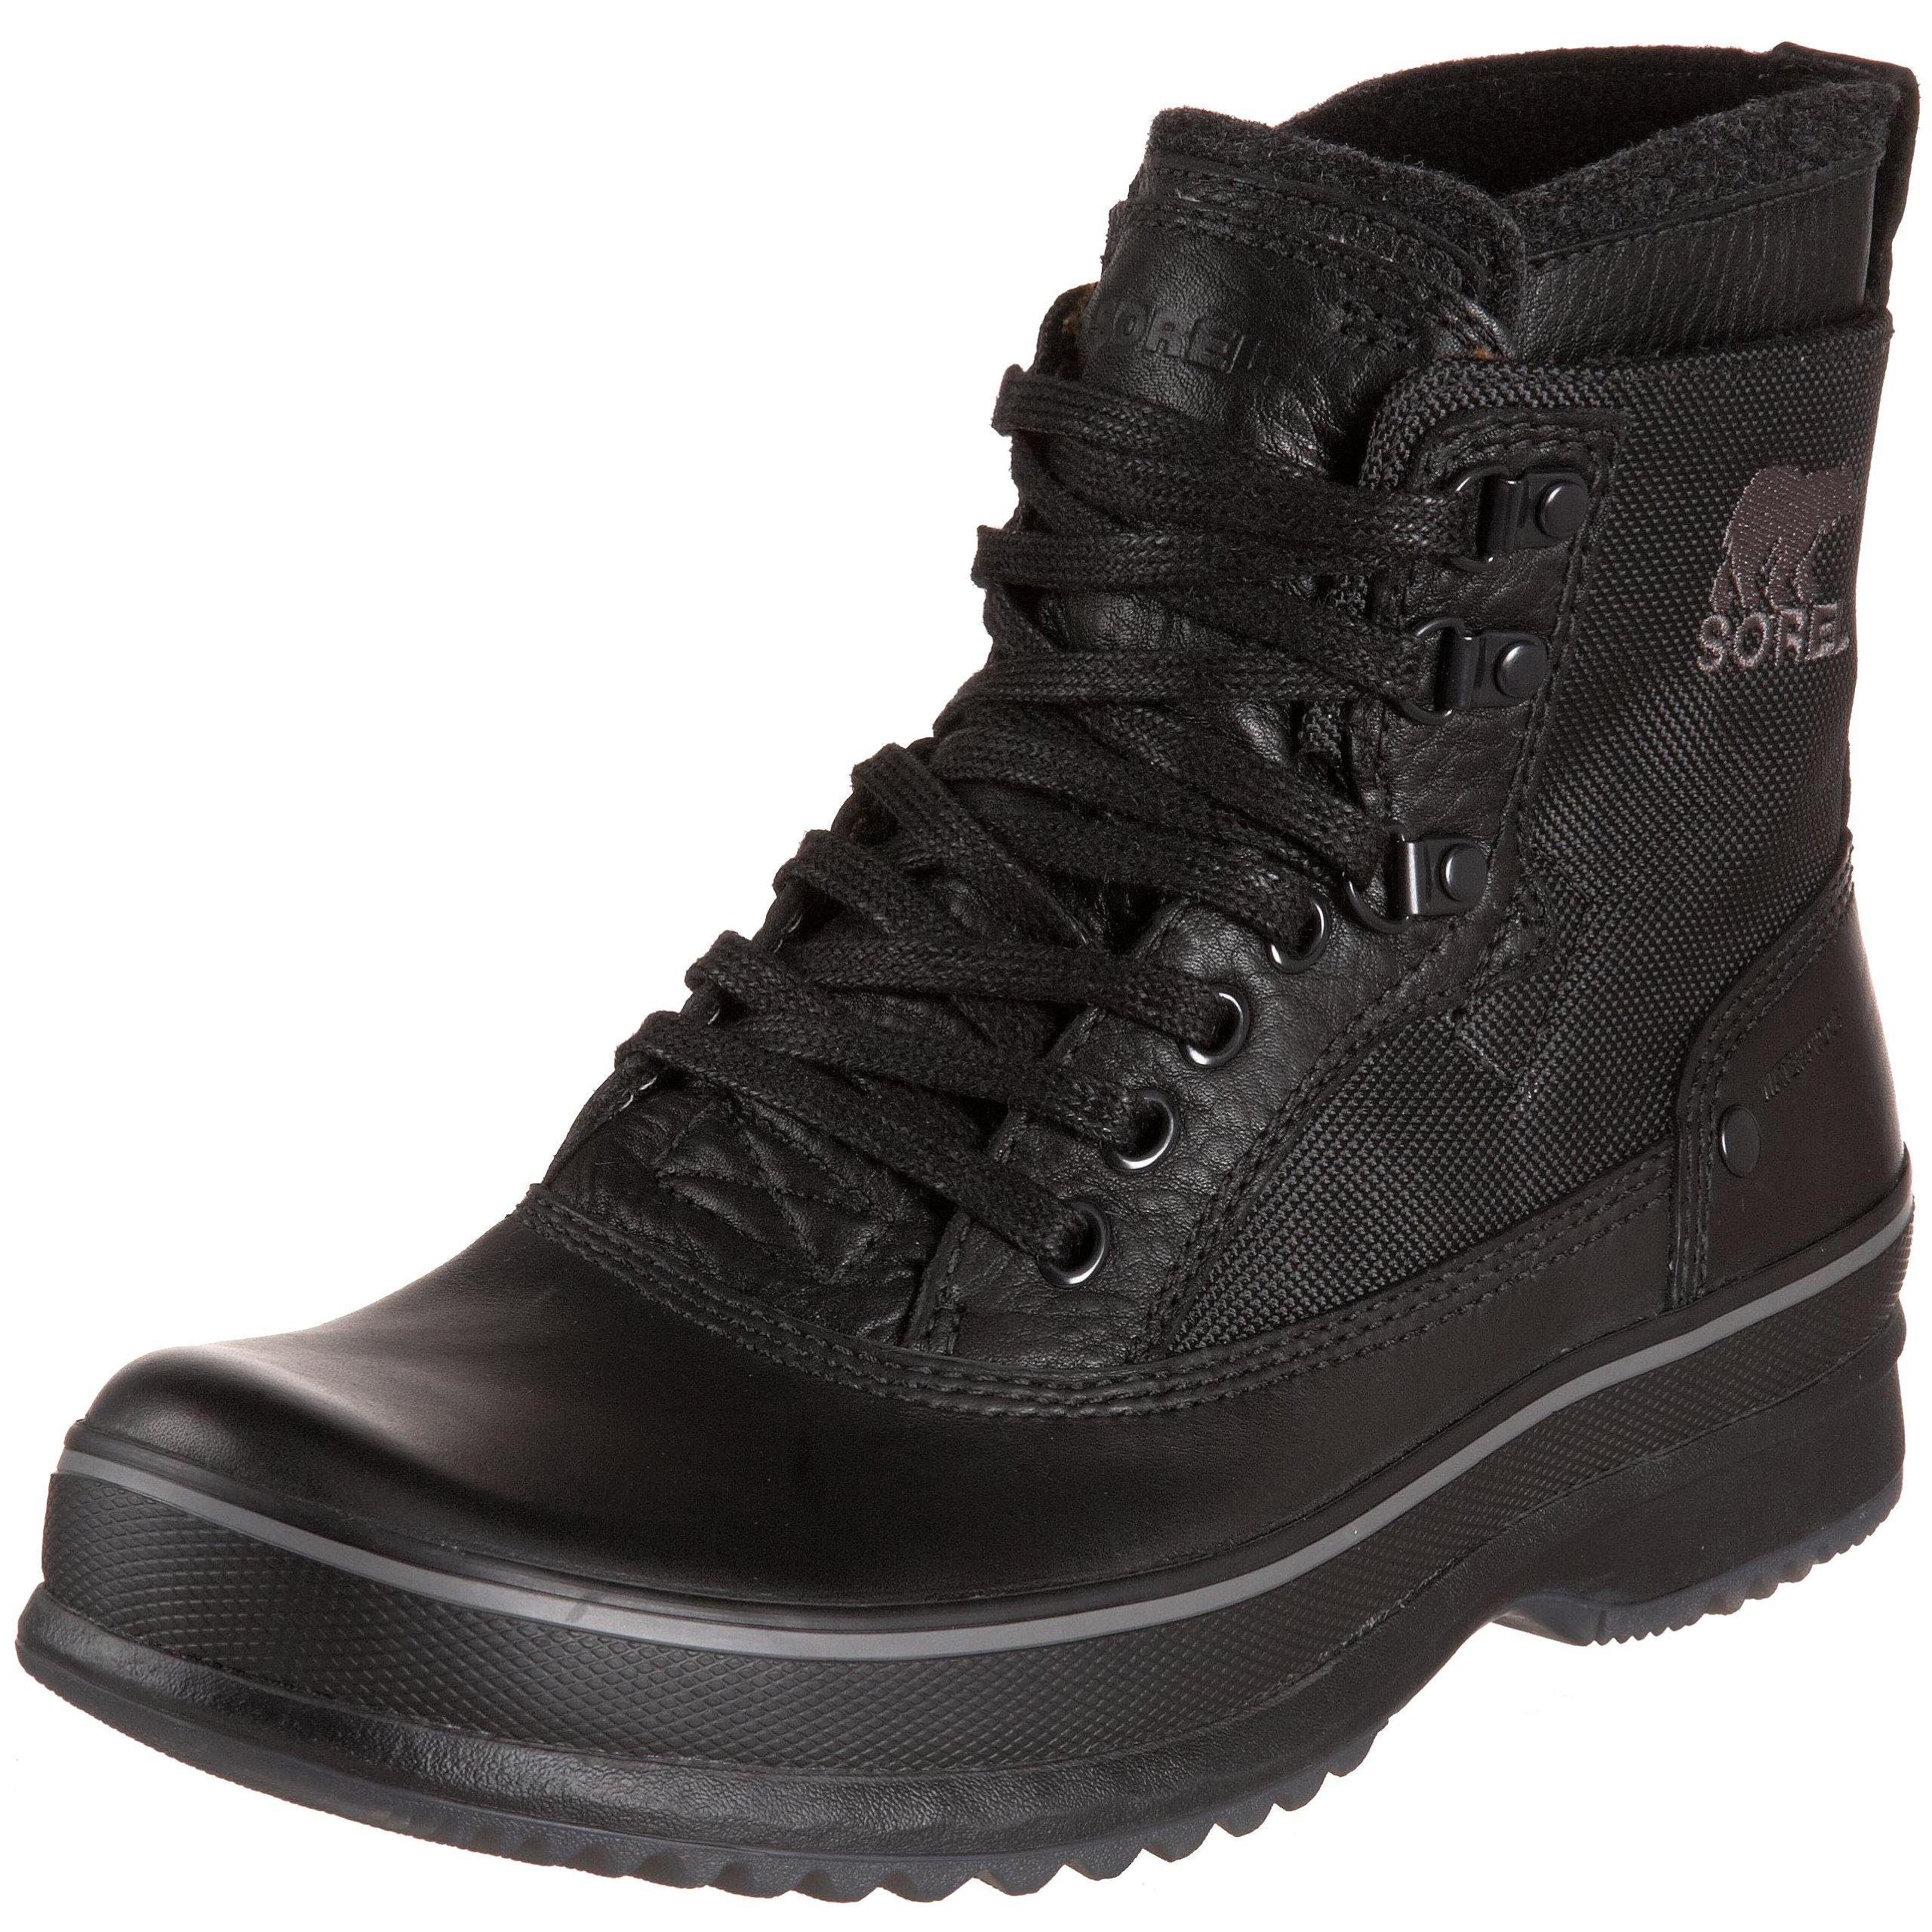 Sorel Men's Brimley NM1565 Boot,Black,11.5 M US